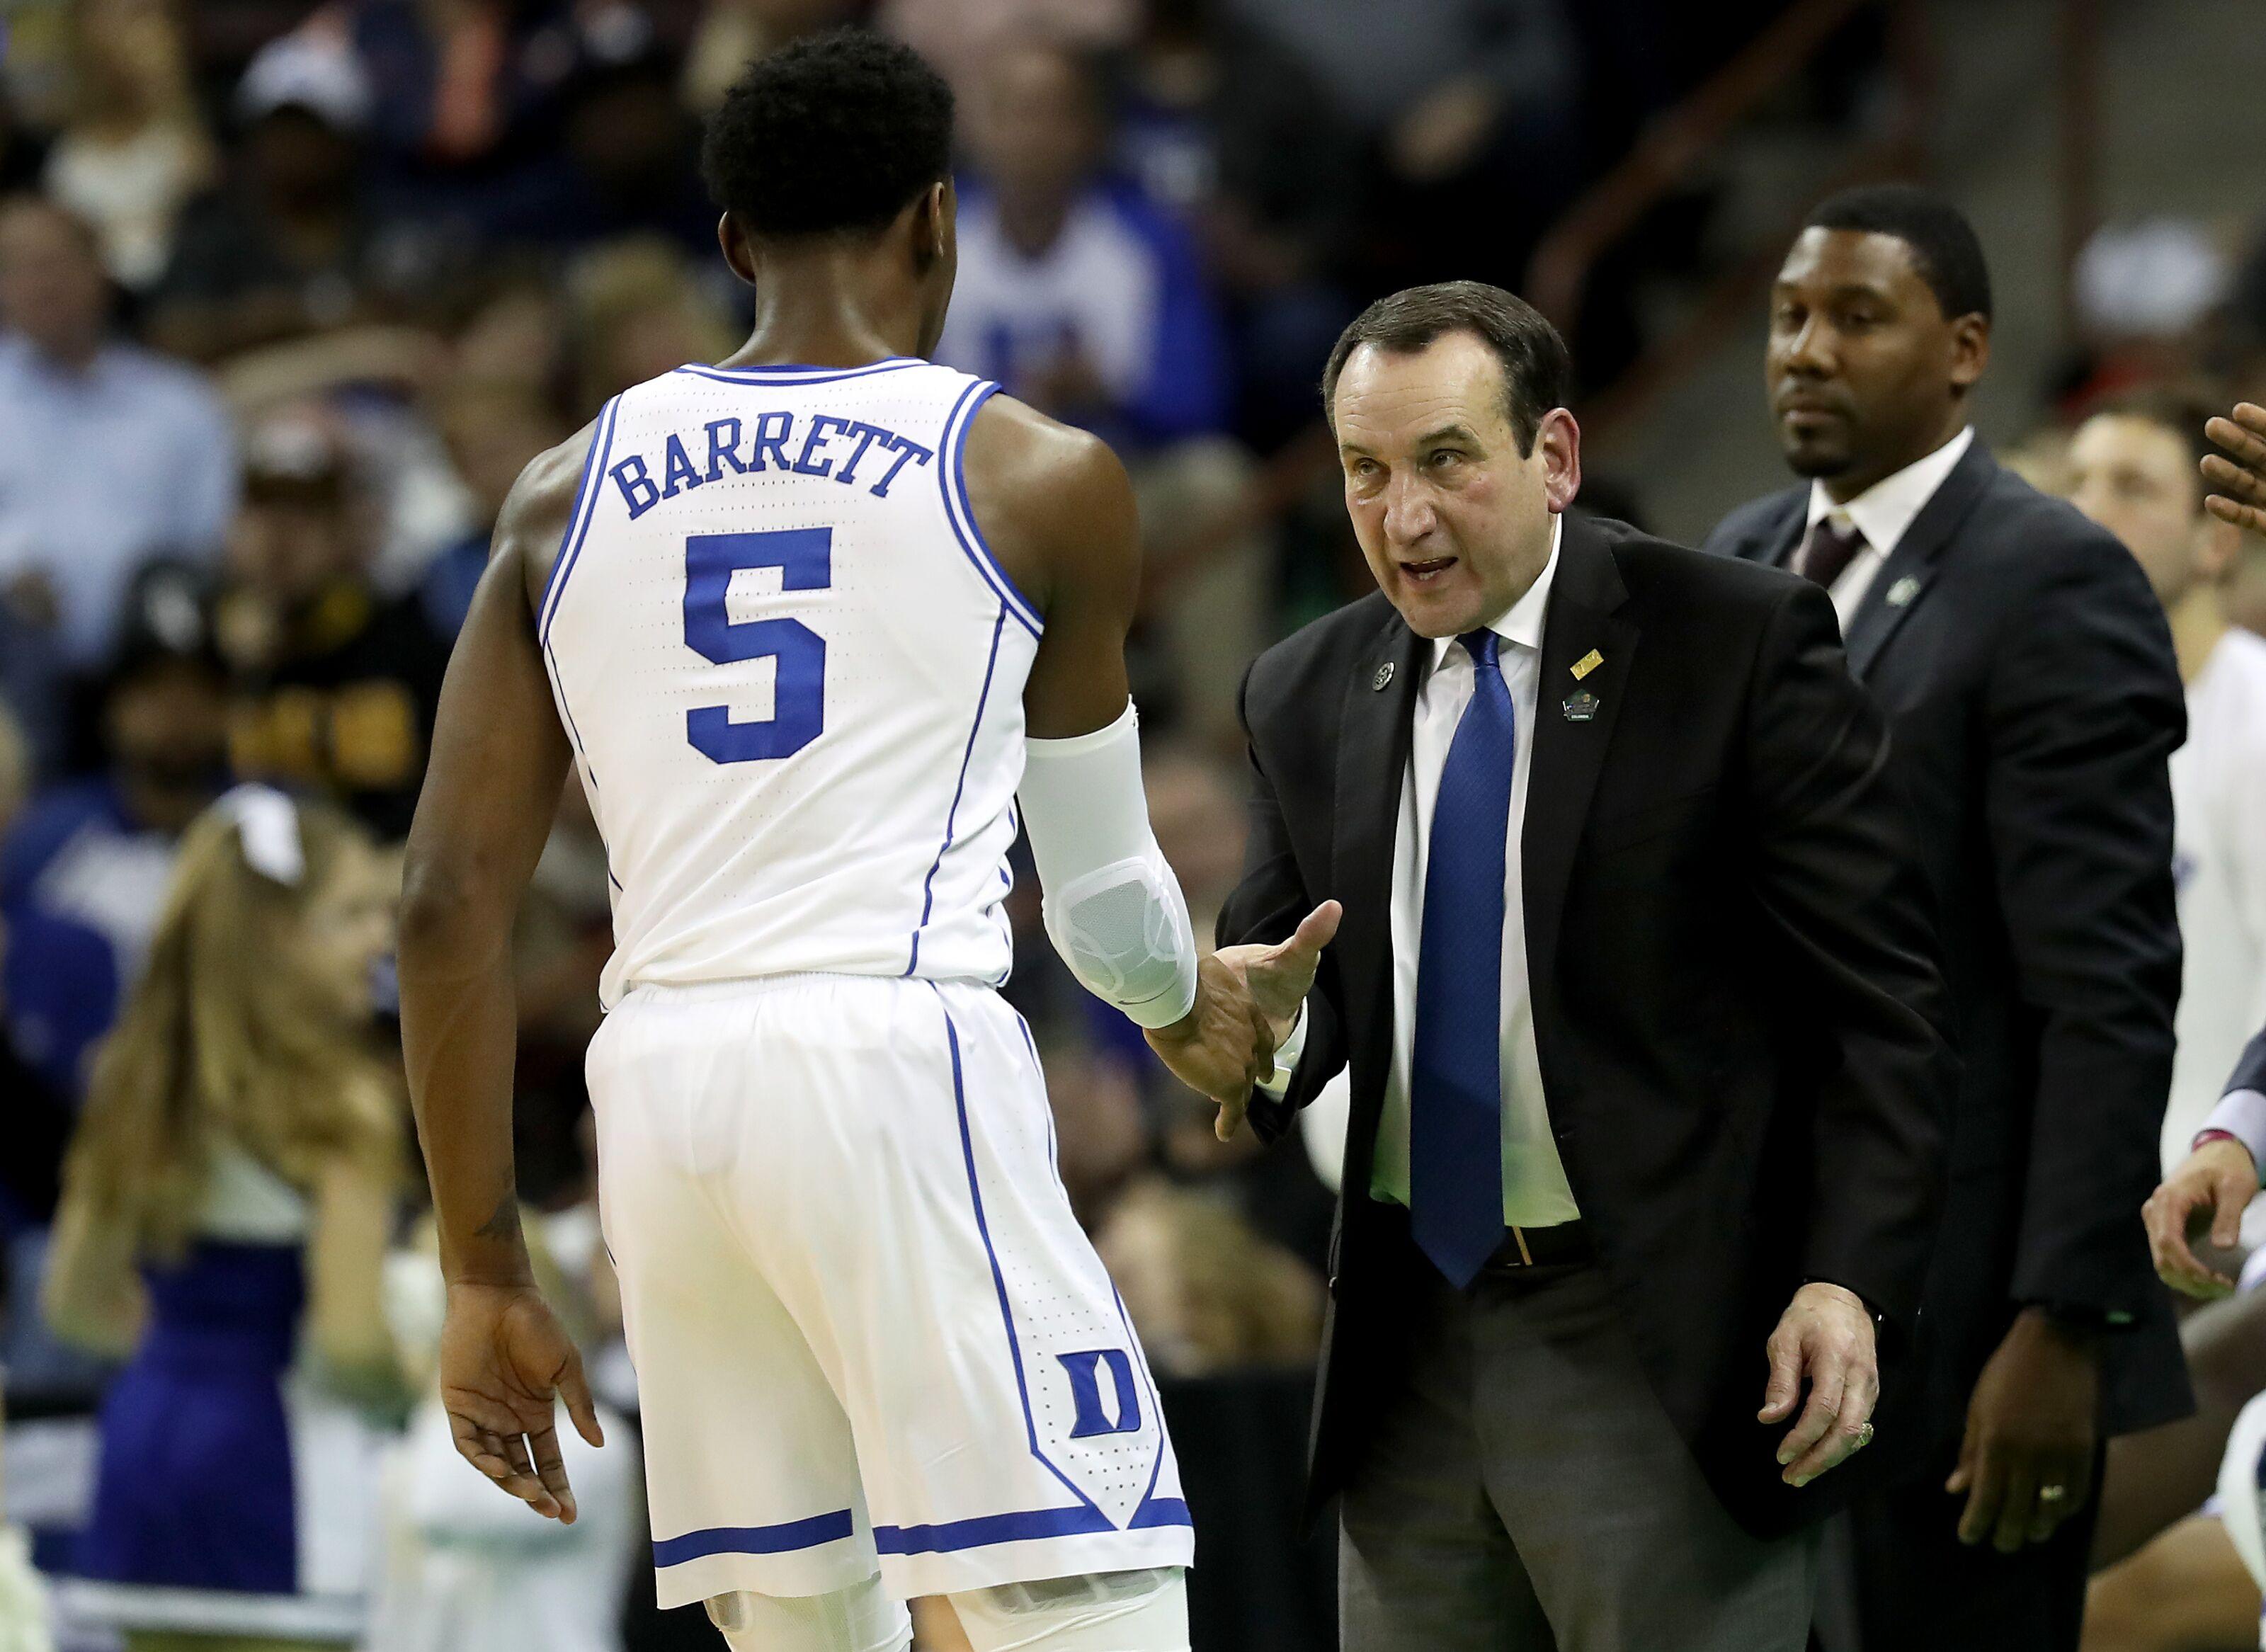 Duke Basketball: With sights set on Sweet 16, Blue Devils face UCF